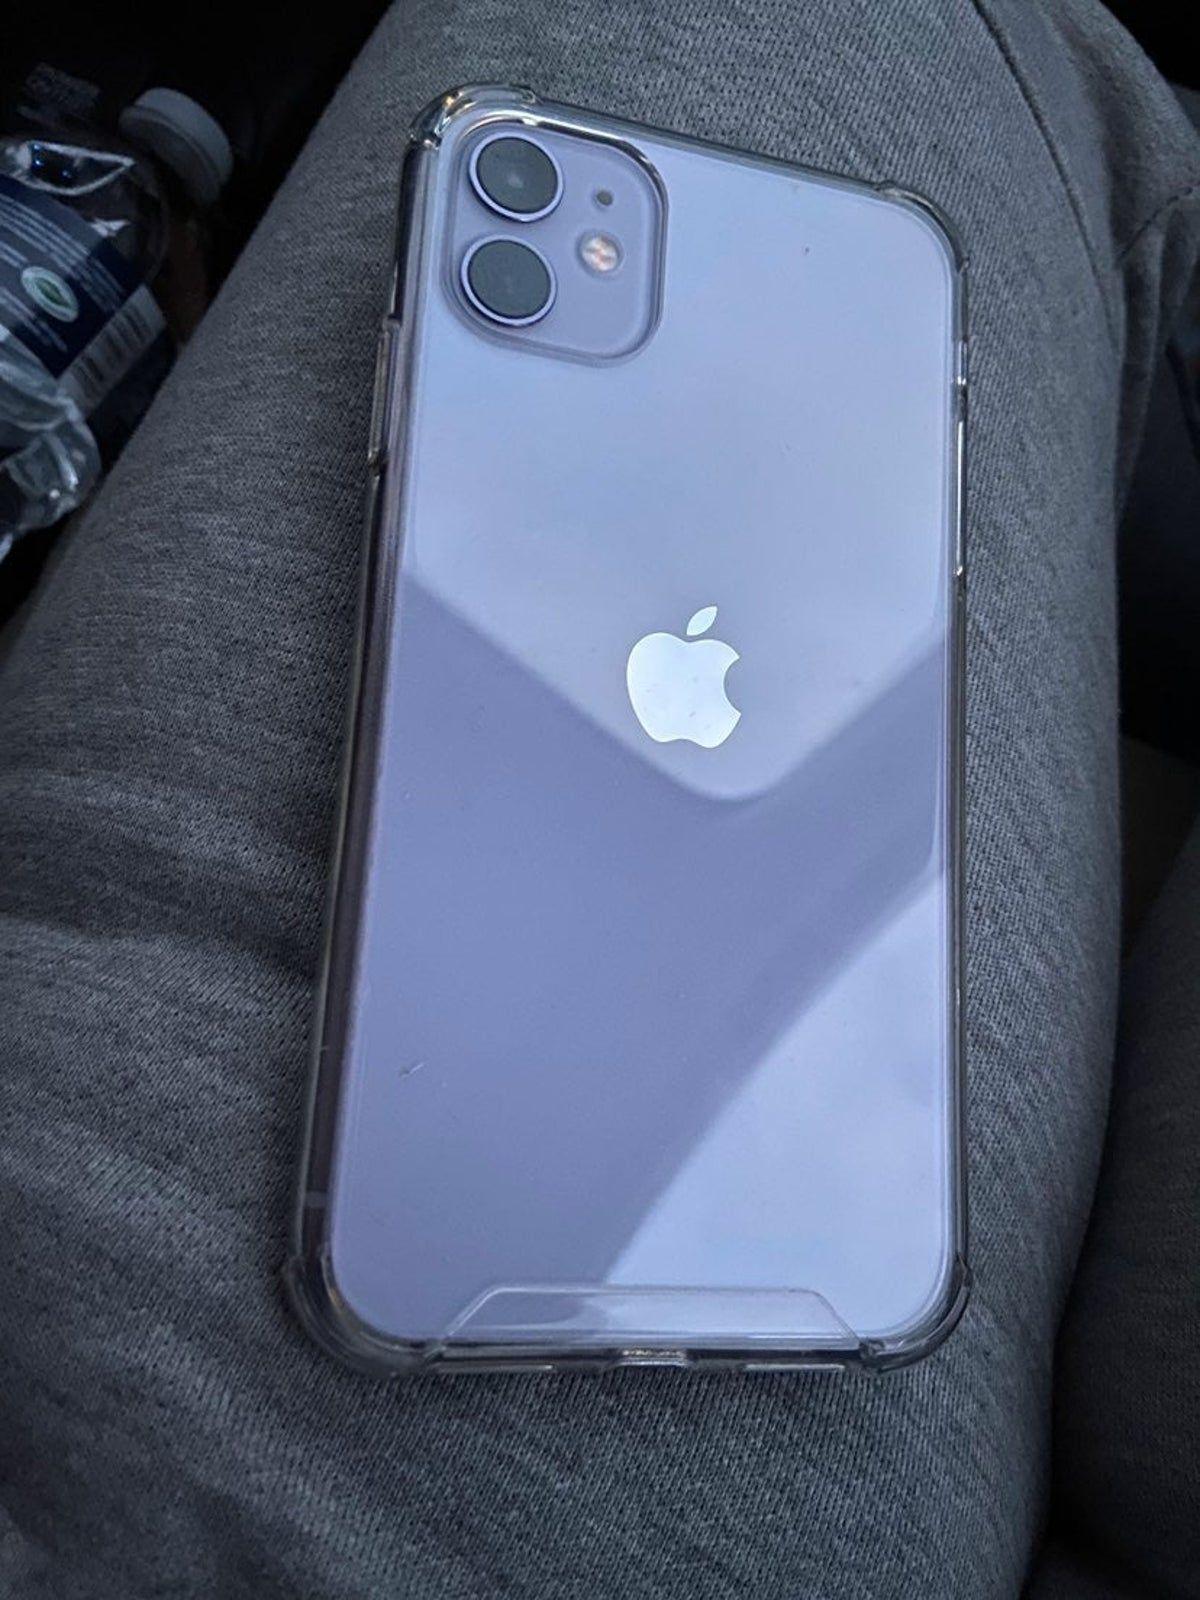 Iphone 11 Purple 64gb In 2020 Iphone Apple Iphone Accessories Iphone Phone Cases